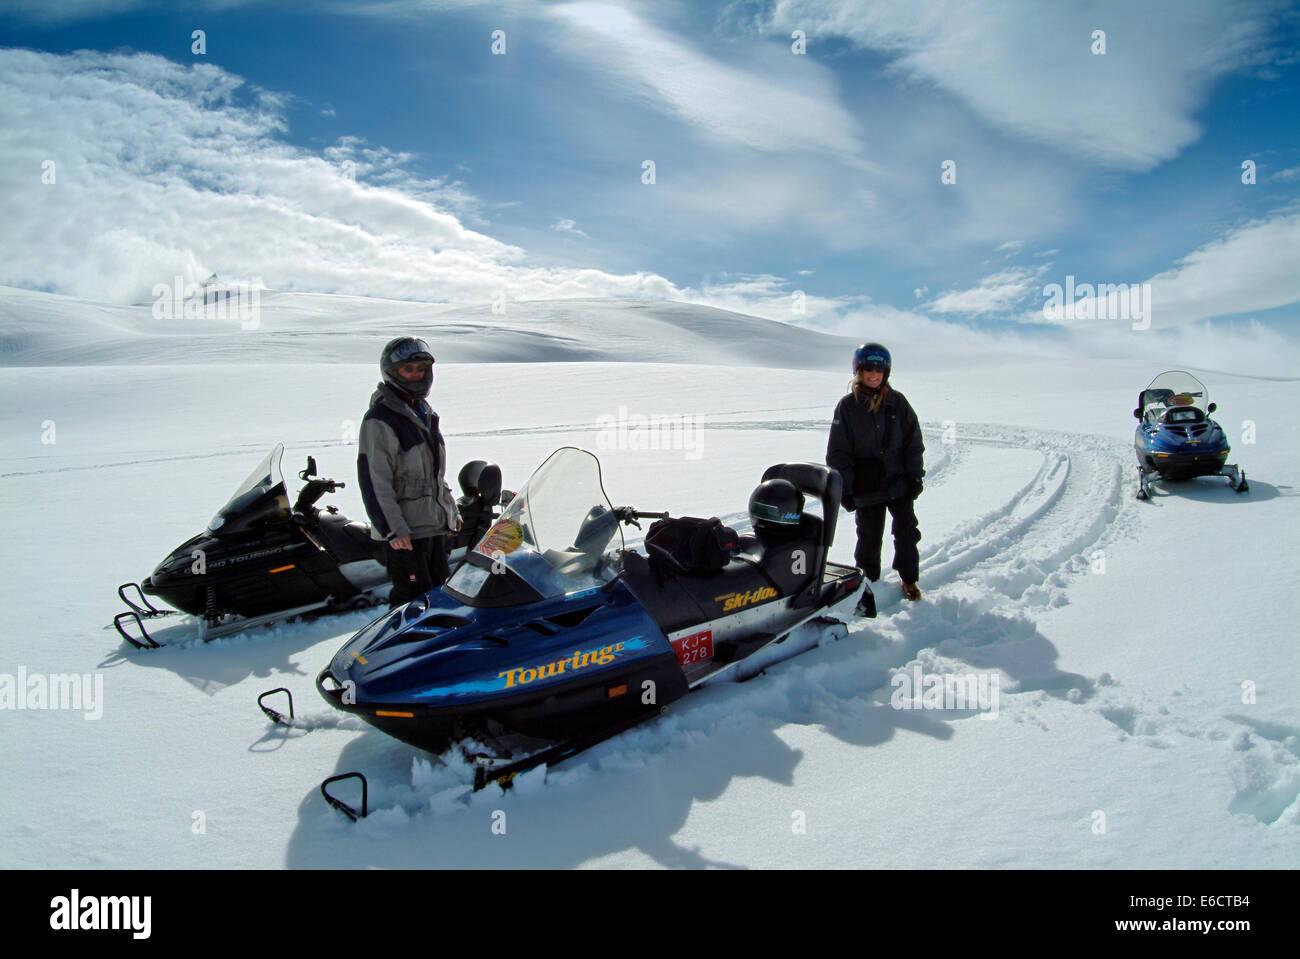 Vatnajokull ice cap, Iceland. - Stock Image